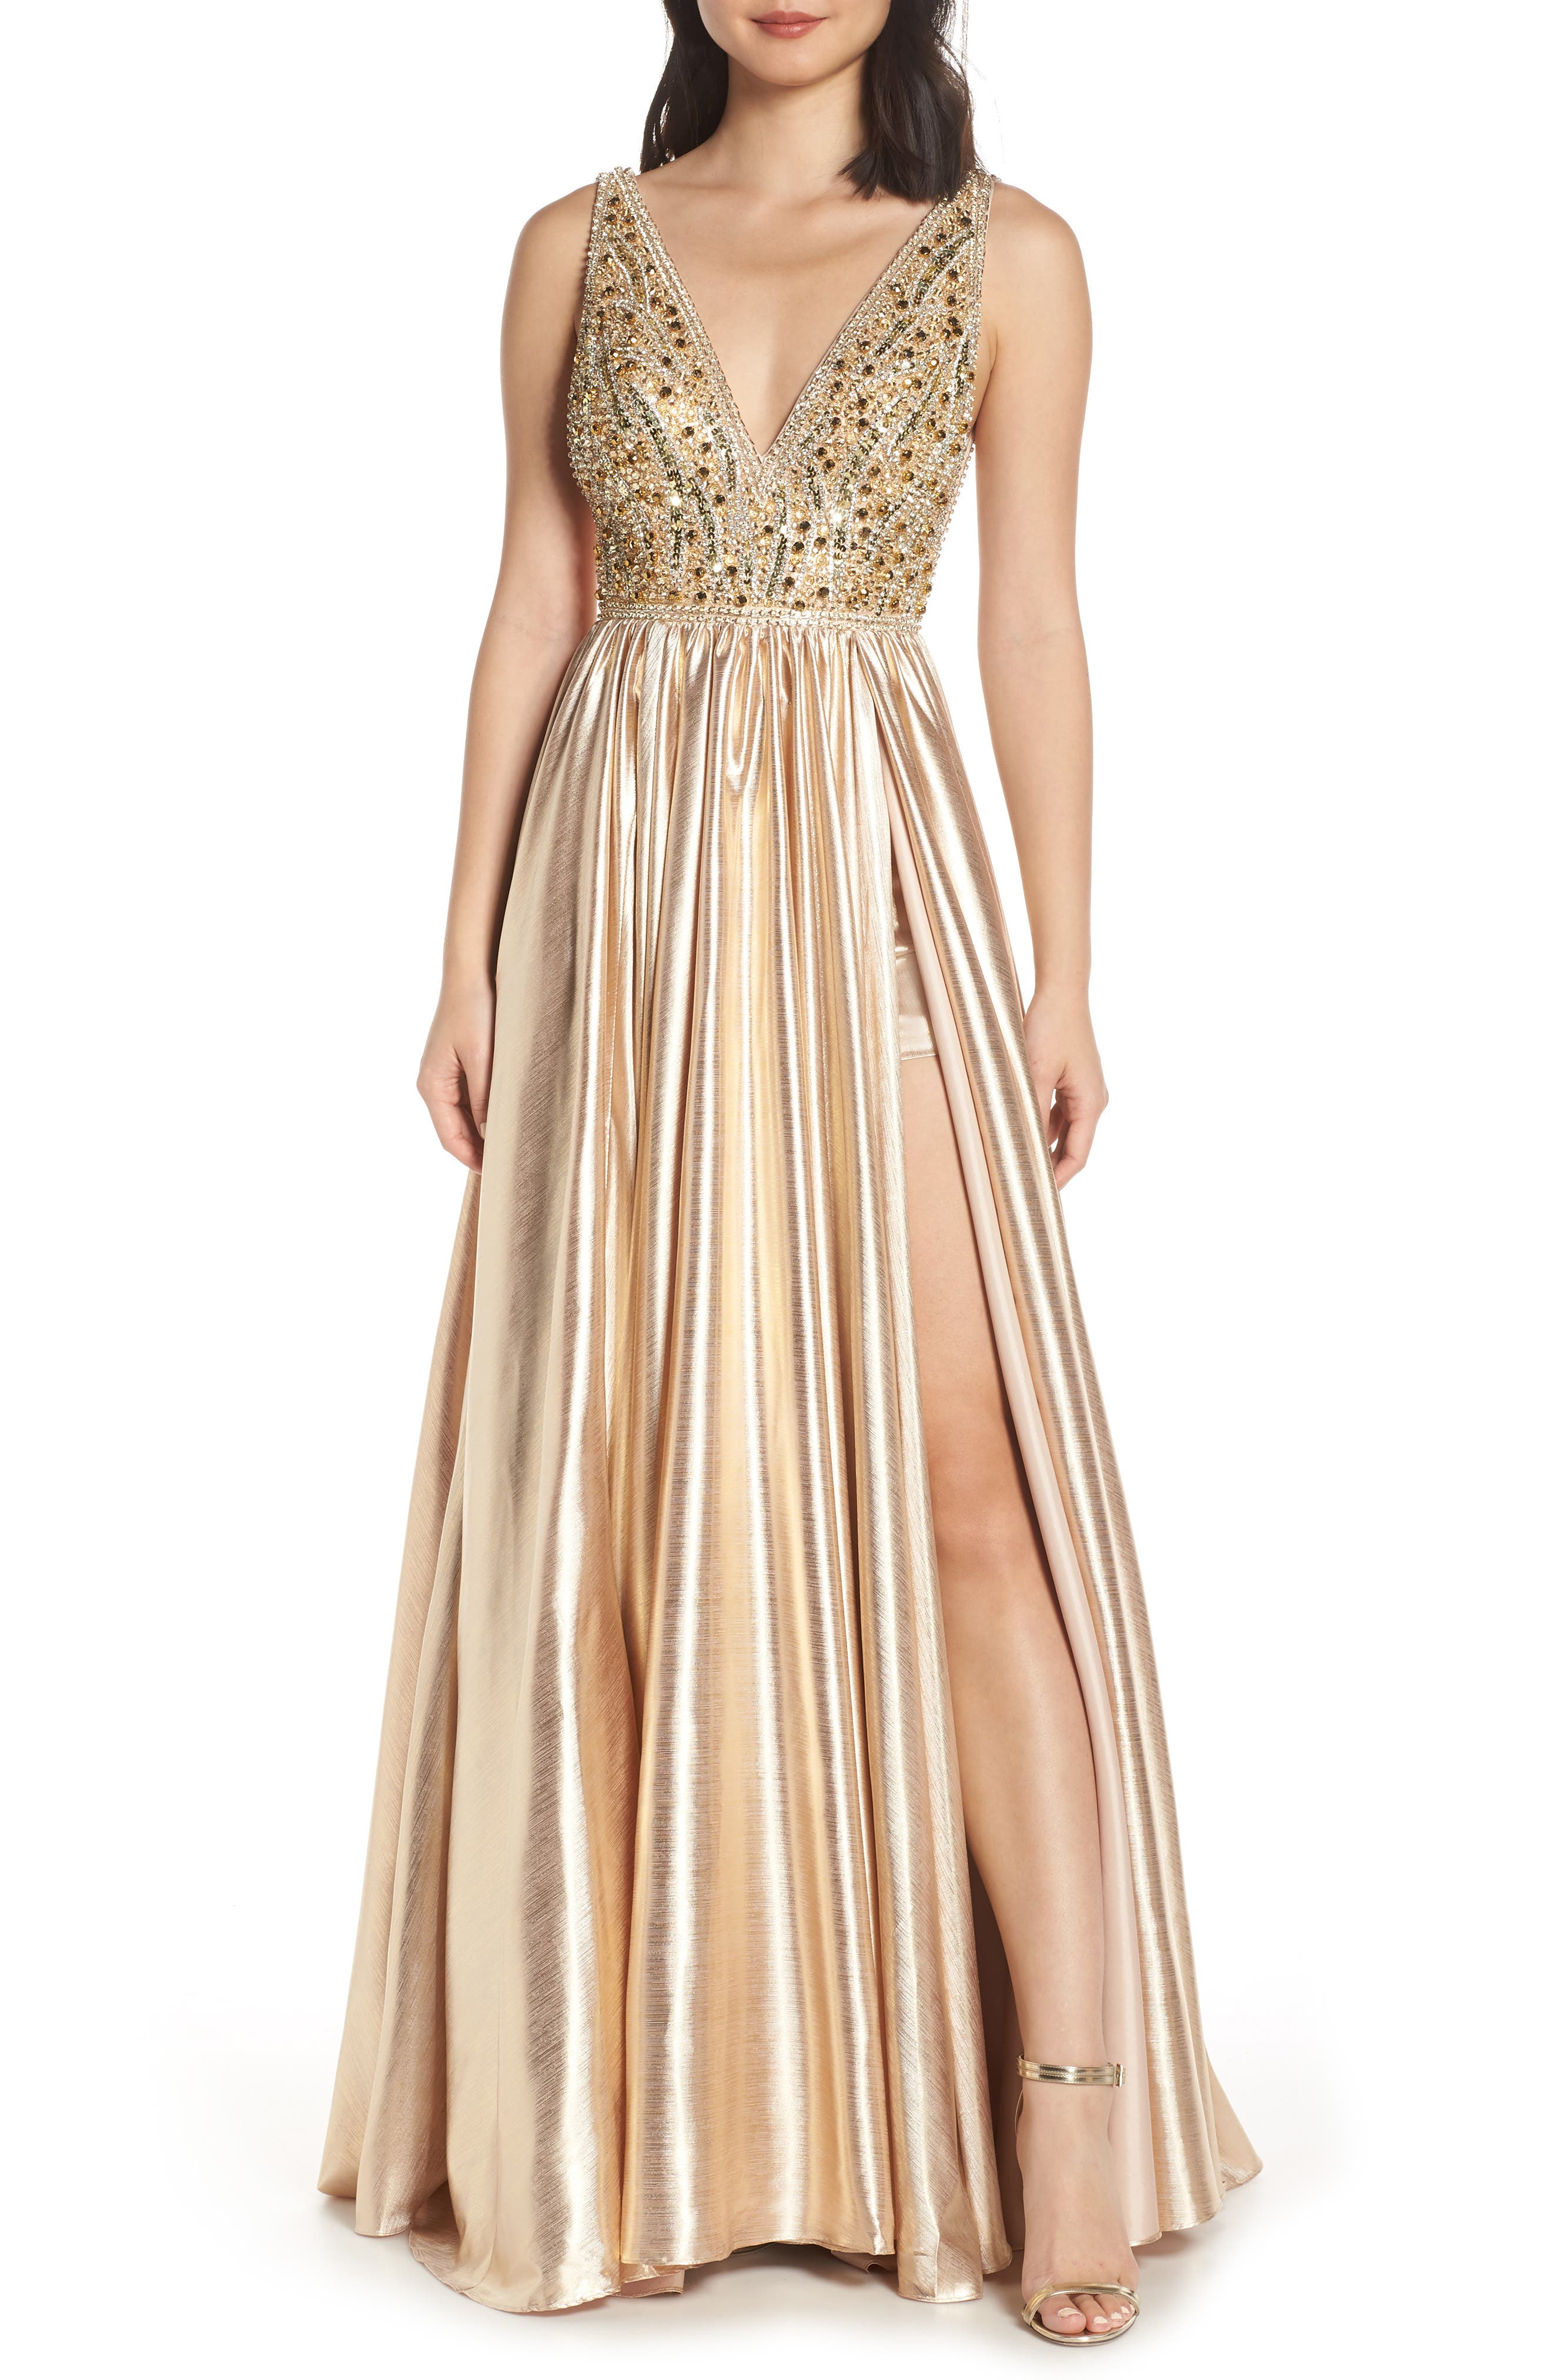 MAC DUGGAL, V-Neck Metallic Sequin Evening Dress, Main thumbnail 1, color, GOLD